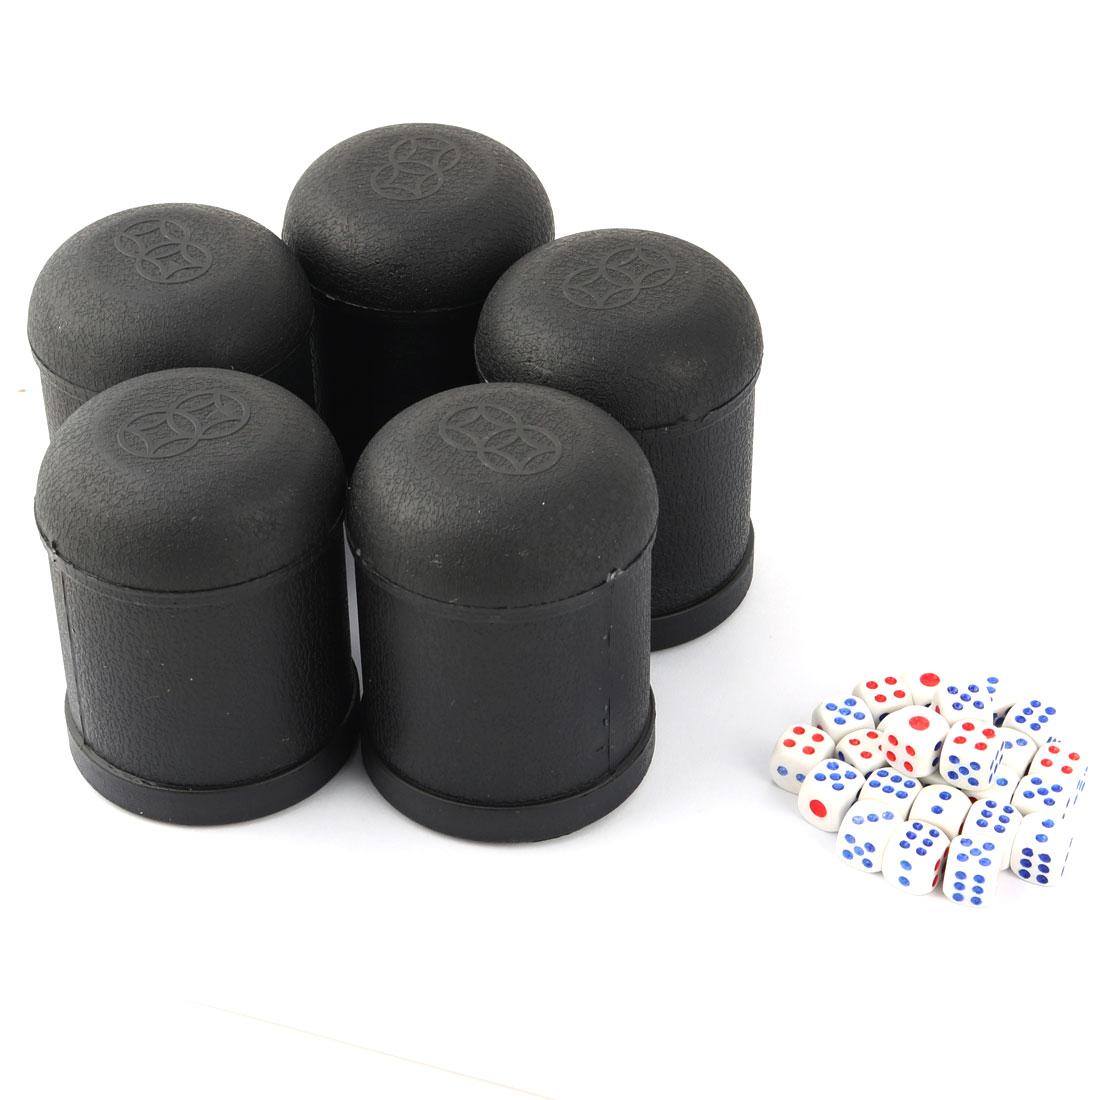 KTV Pub Bar Party Casual Toy Plastic Round Shaker Dice Cup Black 5 PCS